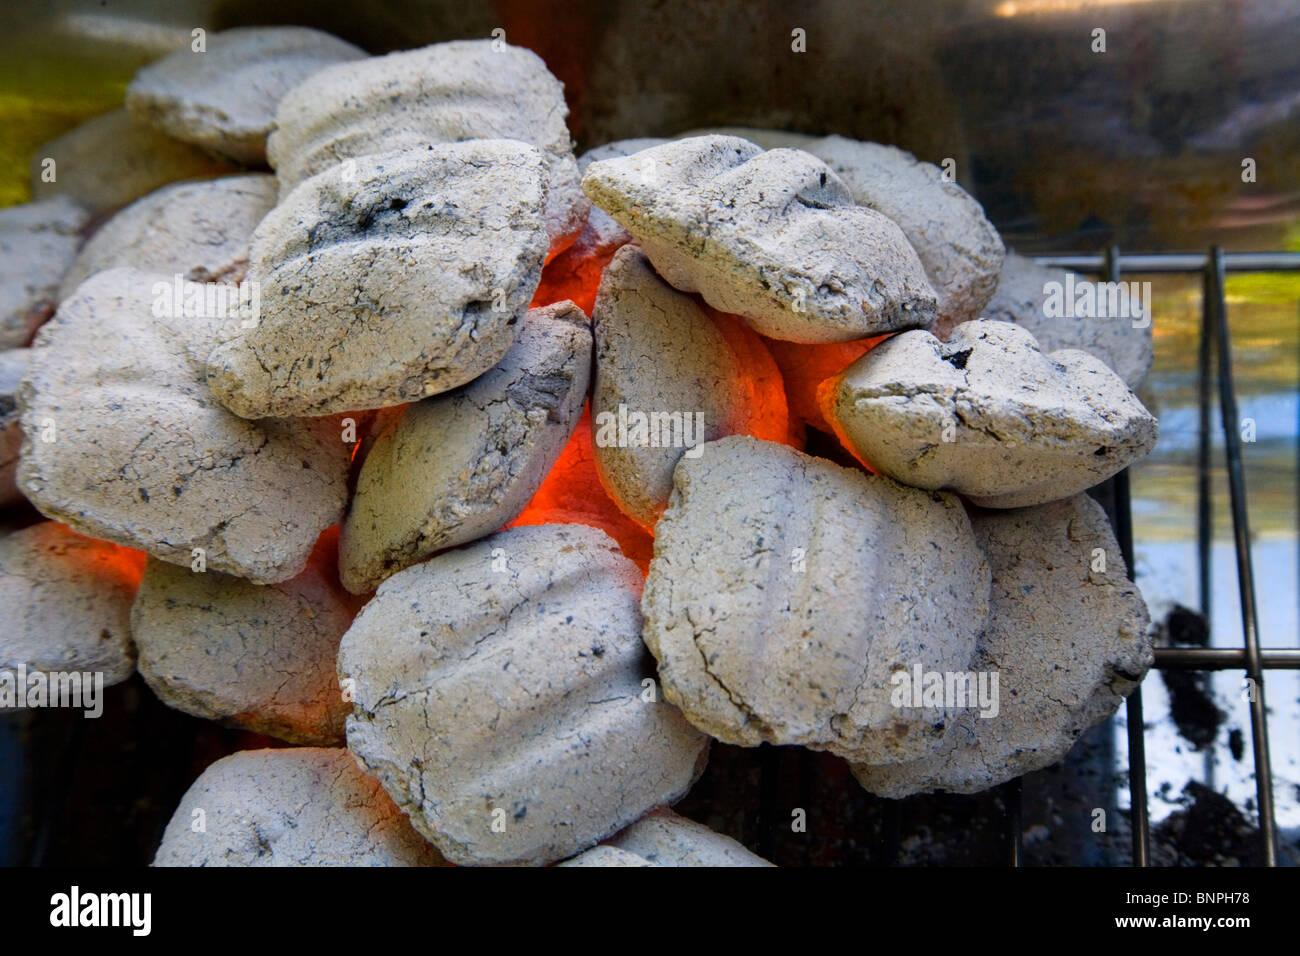 Hot barbecue coals - Stock Image